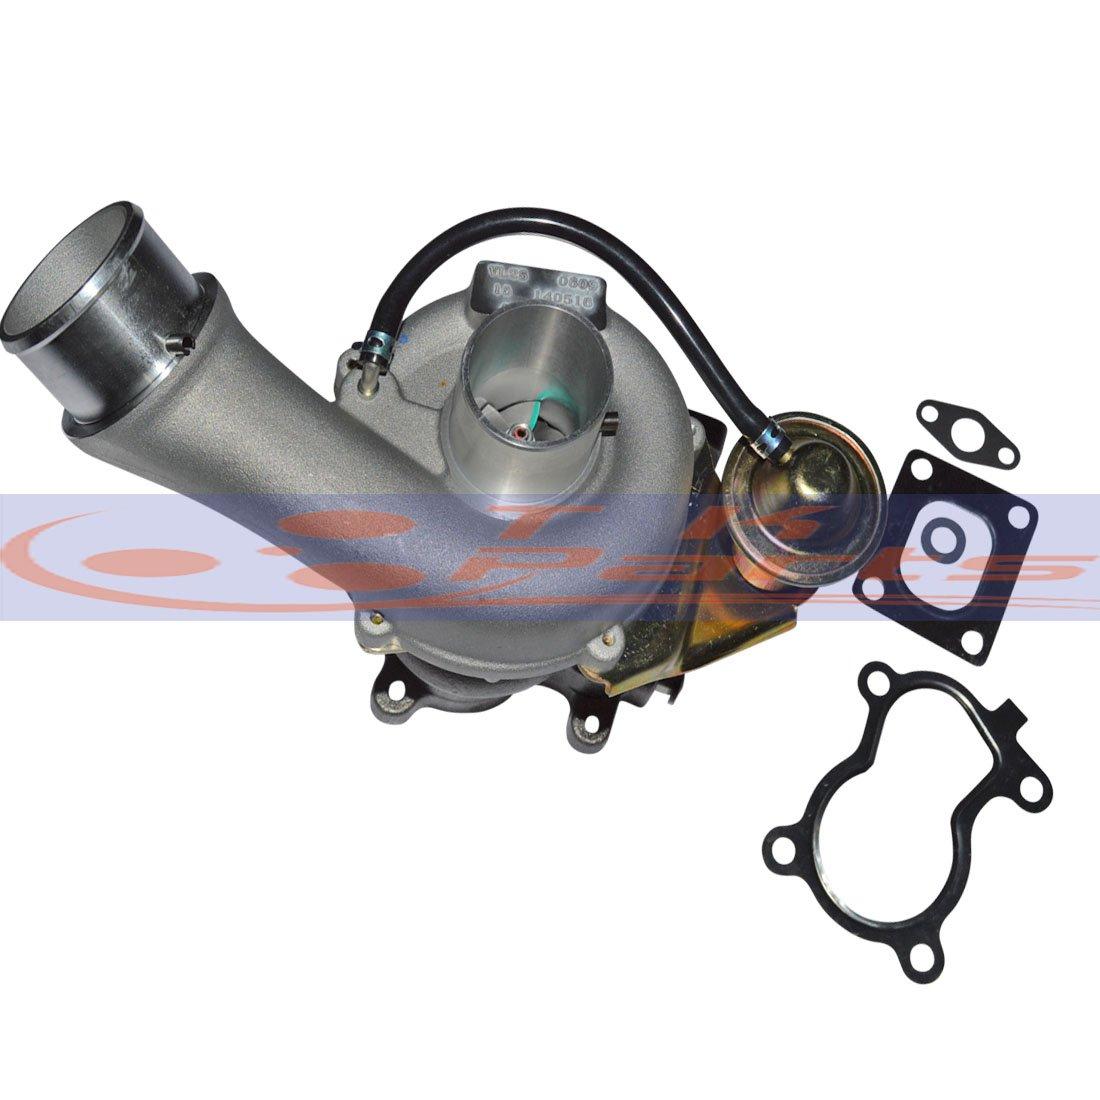 Amazon.com: TKParts New RHF4H VL35 VL25 VG400007 55181245 71783881 Turbo Charger For FIAT Doblo Punto II Idea Lancia Musa 1.9 JTD 1.9L 2003-07 Engine: ...